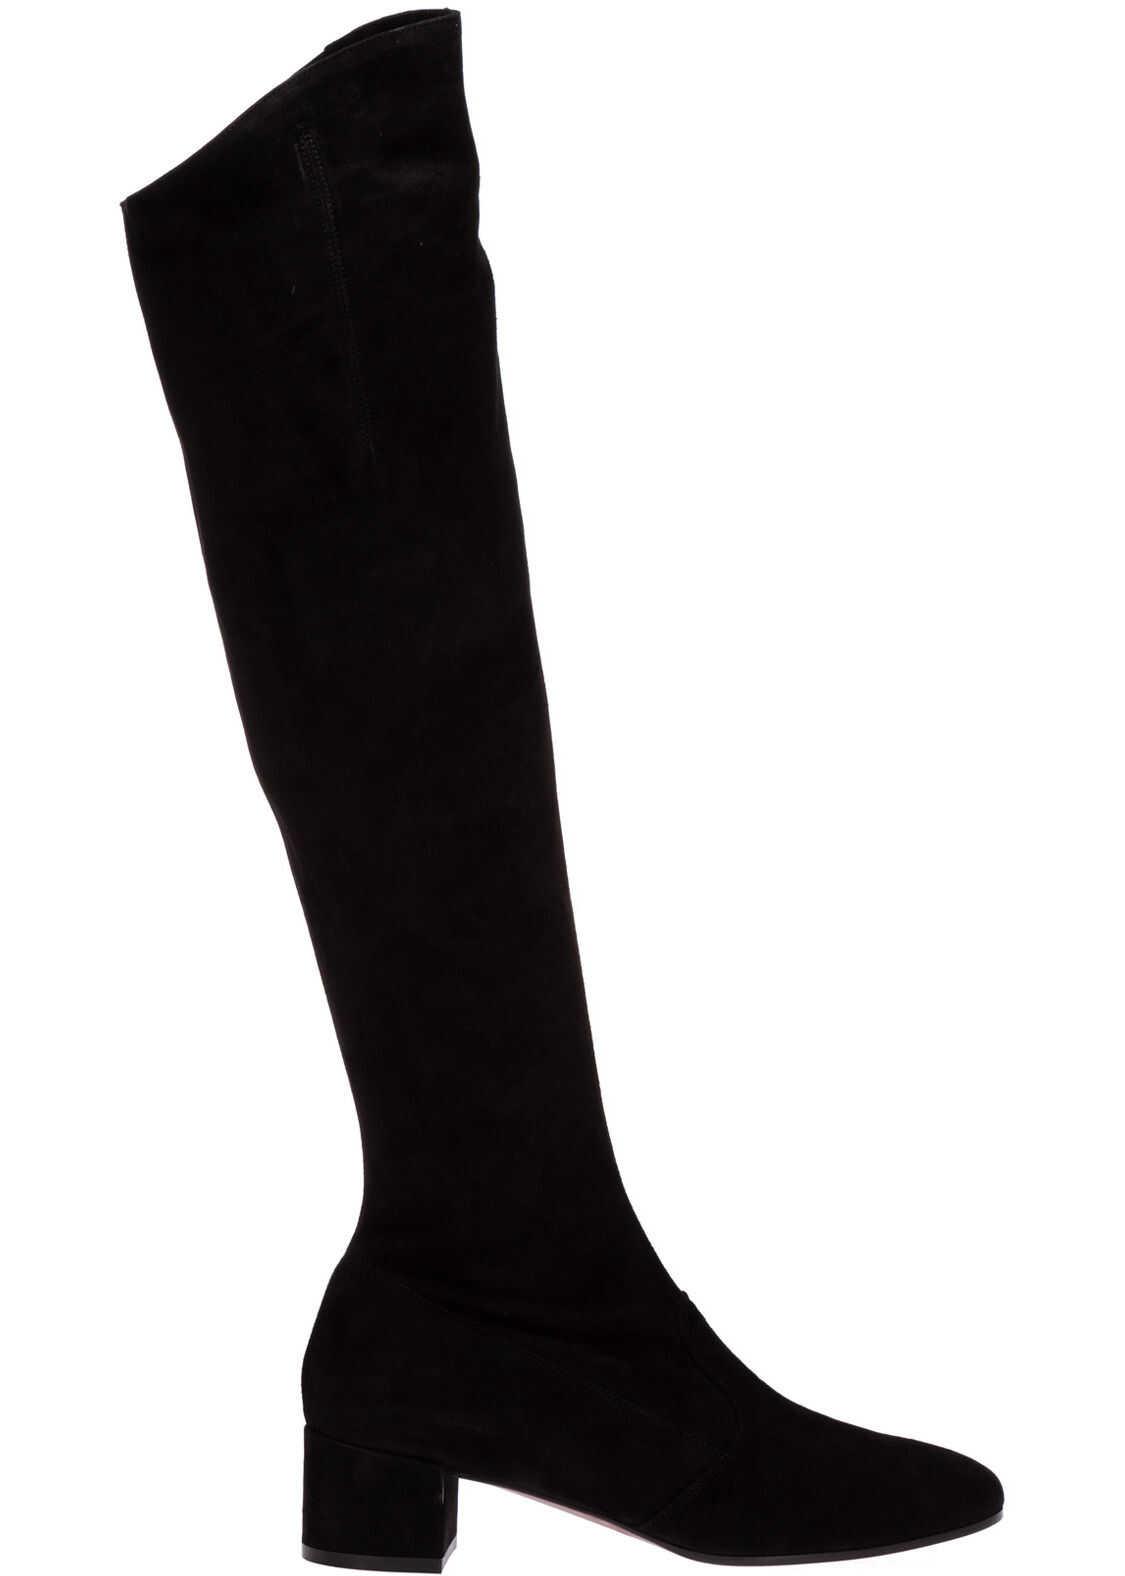 L'Autre Chose Heel Boots LDL9797.40WP05401001 Black imagine b-mall.ro